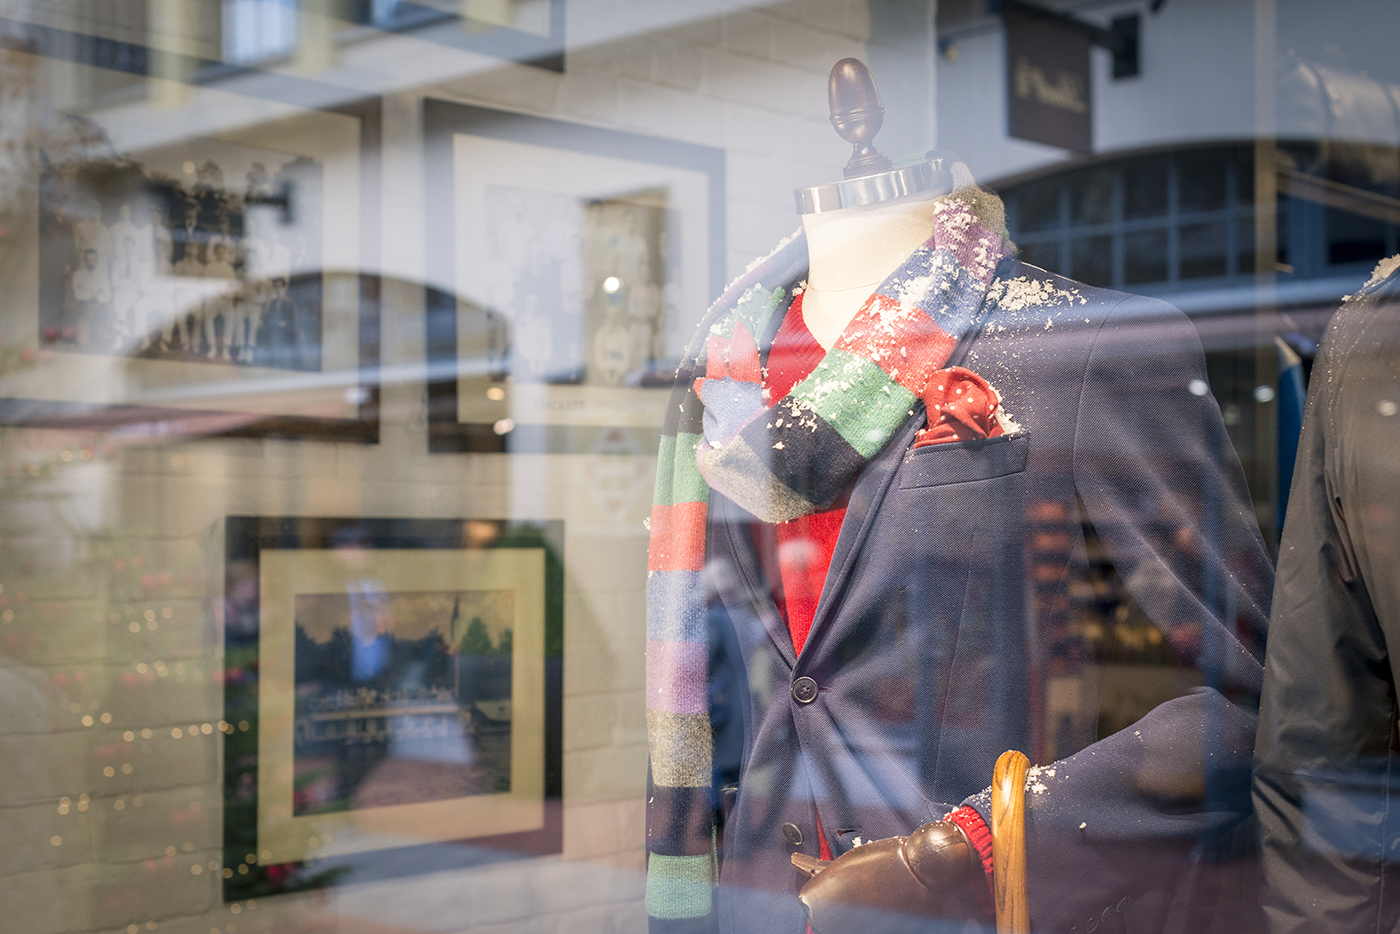 Ingolstadt Village, Nuremberg, Christmas market in Nuremberg, Christmas market, Bavaria, Chic Outlet Shopping, annamidday, анна миддэй, анна мидей, тревел блогер, русский тревел блогер, лучший блогер, лучший российский блогер, аутлеты европы